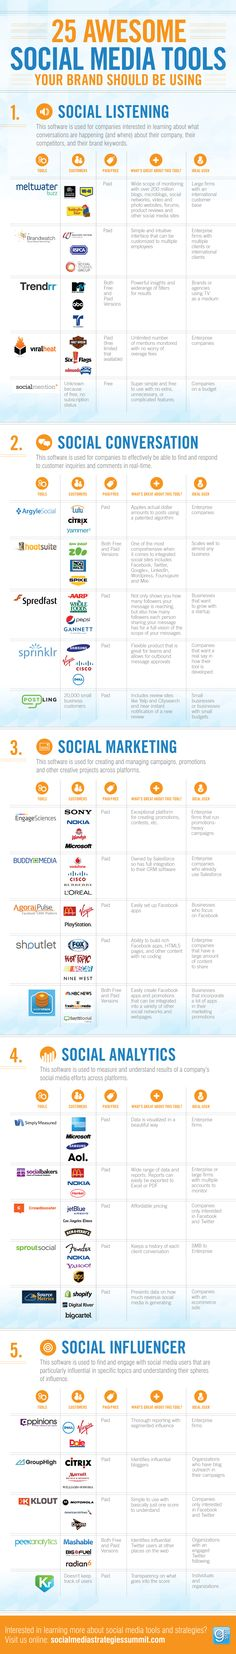 25 herramientas impresionantes para Redes Sociales #infografia #infographic #socialmedia